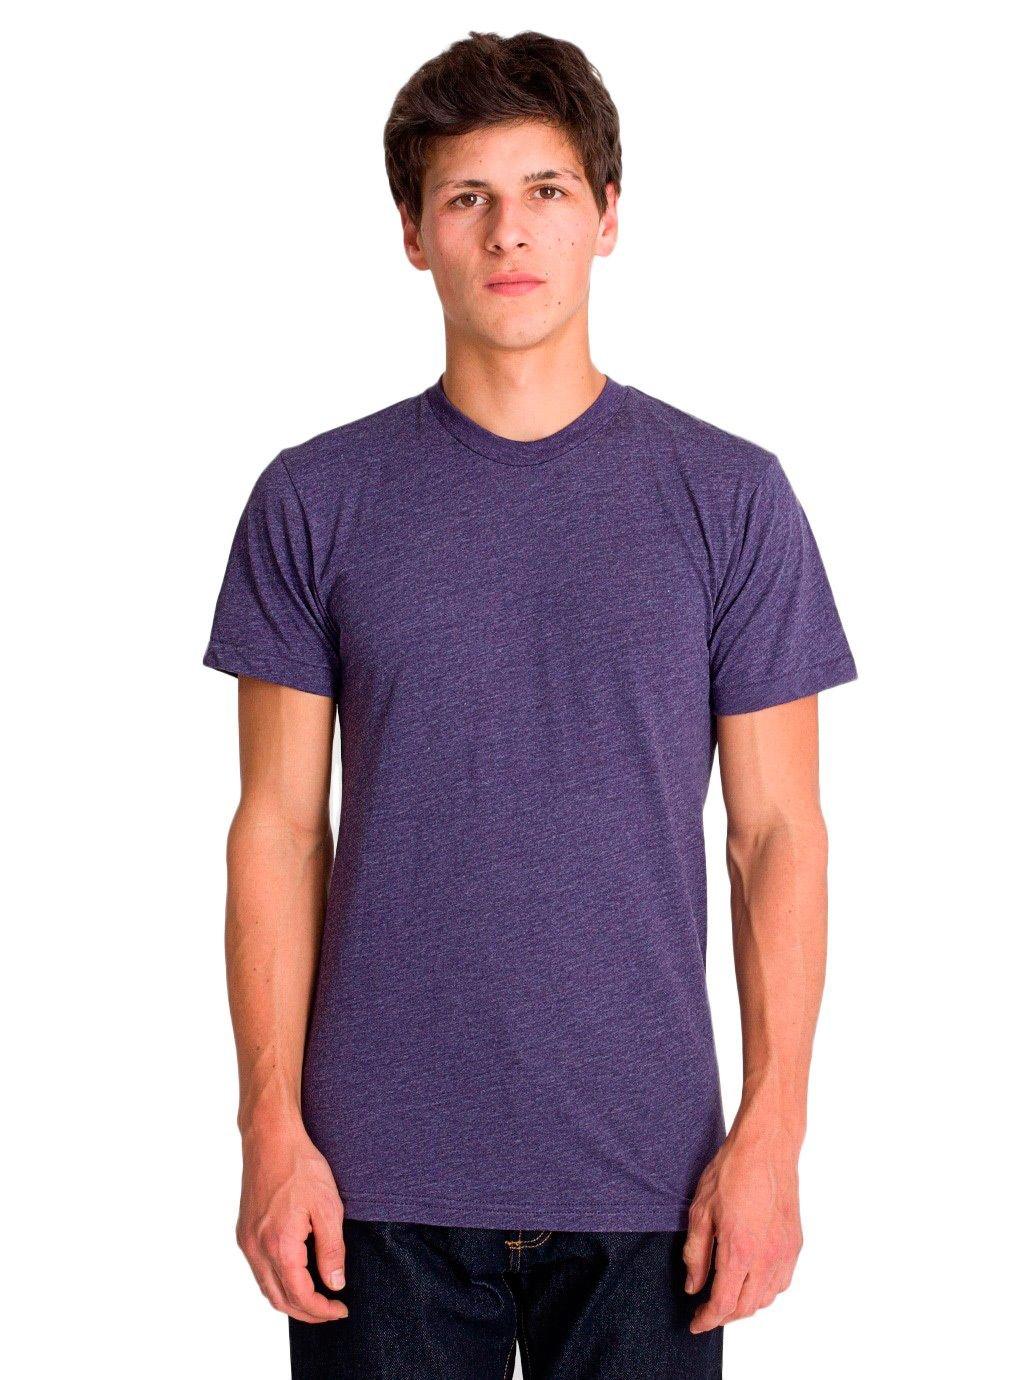 American Apparel Poly-Cotton Short Sleeve Crew Neck, Heather Imperial Purple, Medium